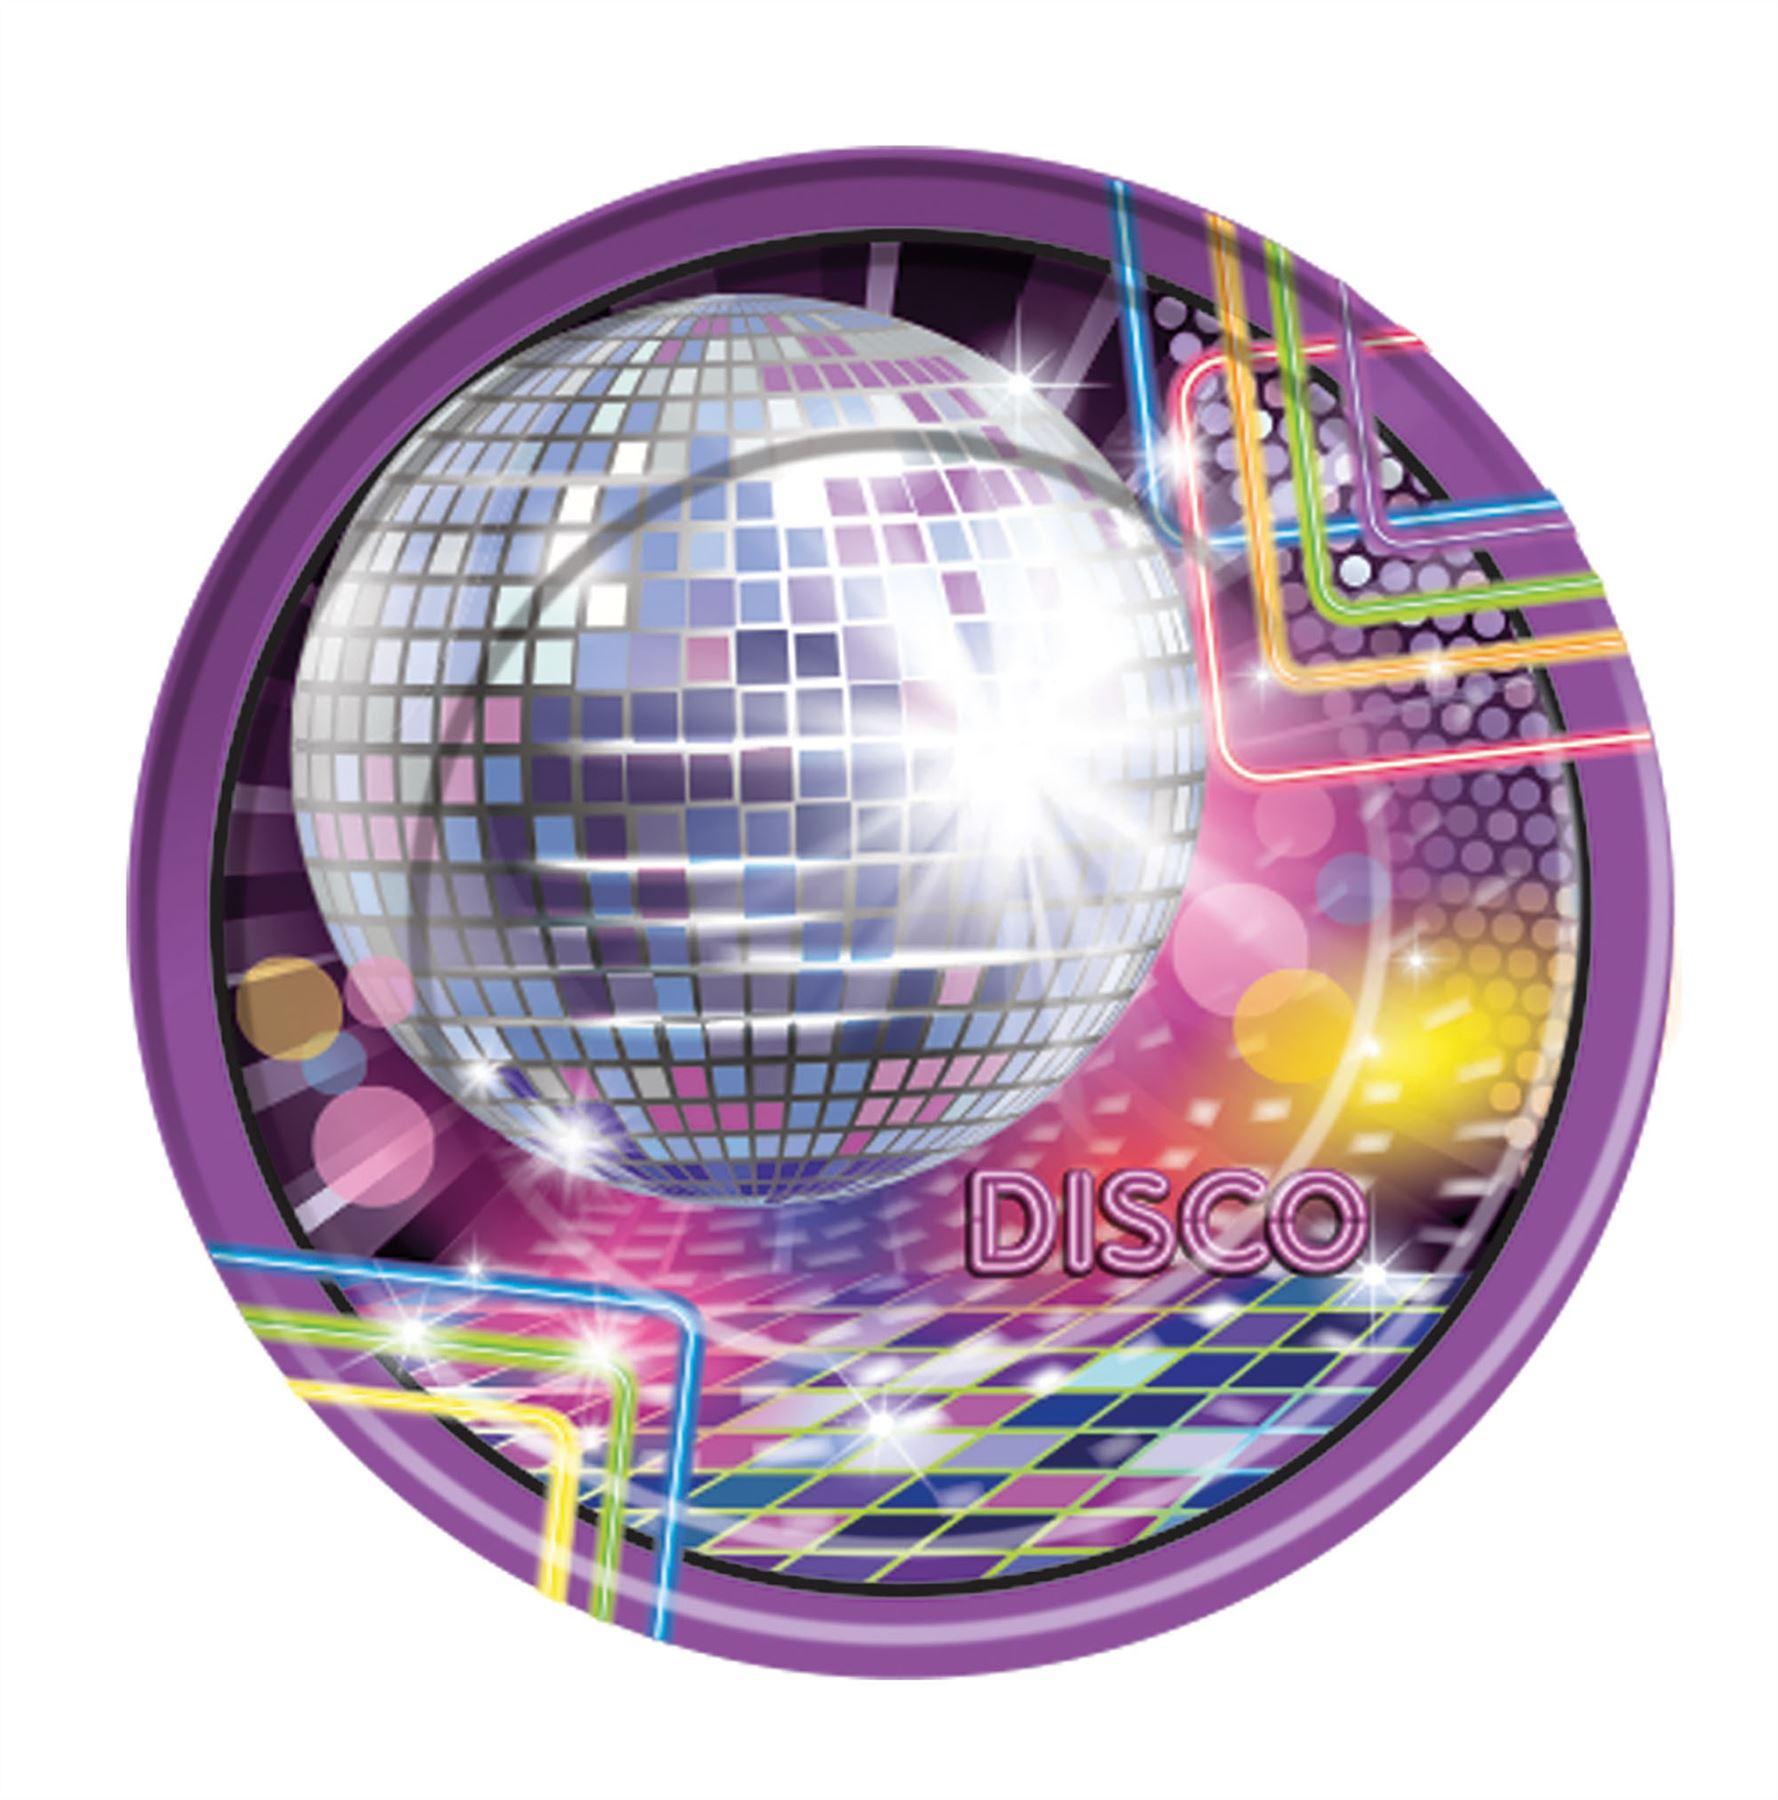 70s-Fun-Party-8-Piece-Disco-Fever-Glitter-  sc 1 st  eBay & 70s Fun Party 8 Piece Disco Fever Glitter Mirror Ball Paper Plates ...